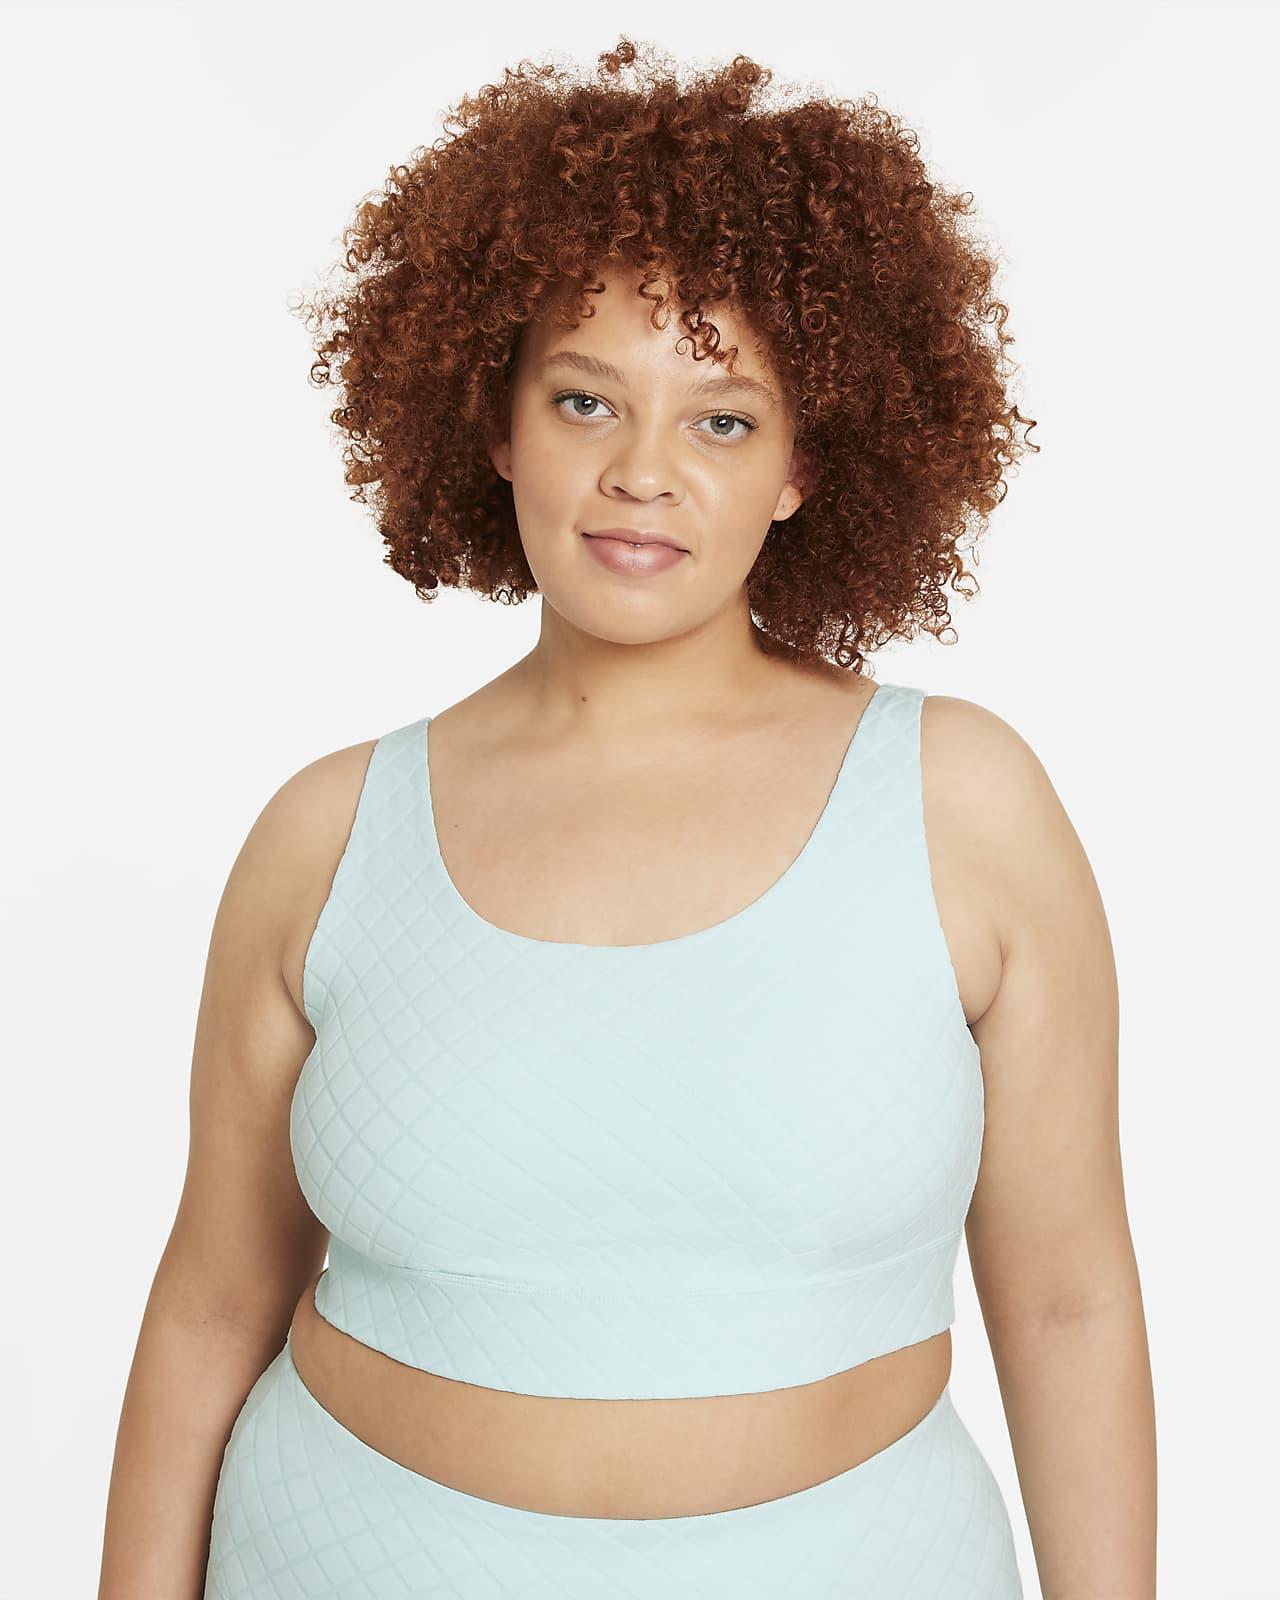 Camiseta de tirantes jacquard corta para mujer talla grande Nike Yoga Luxe